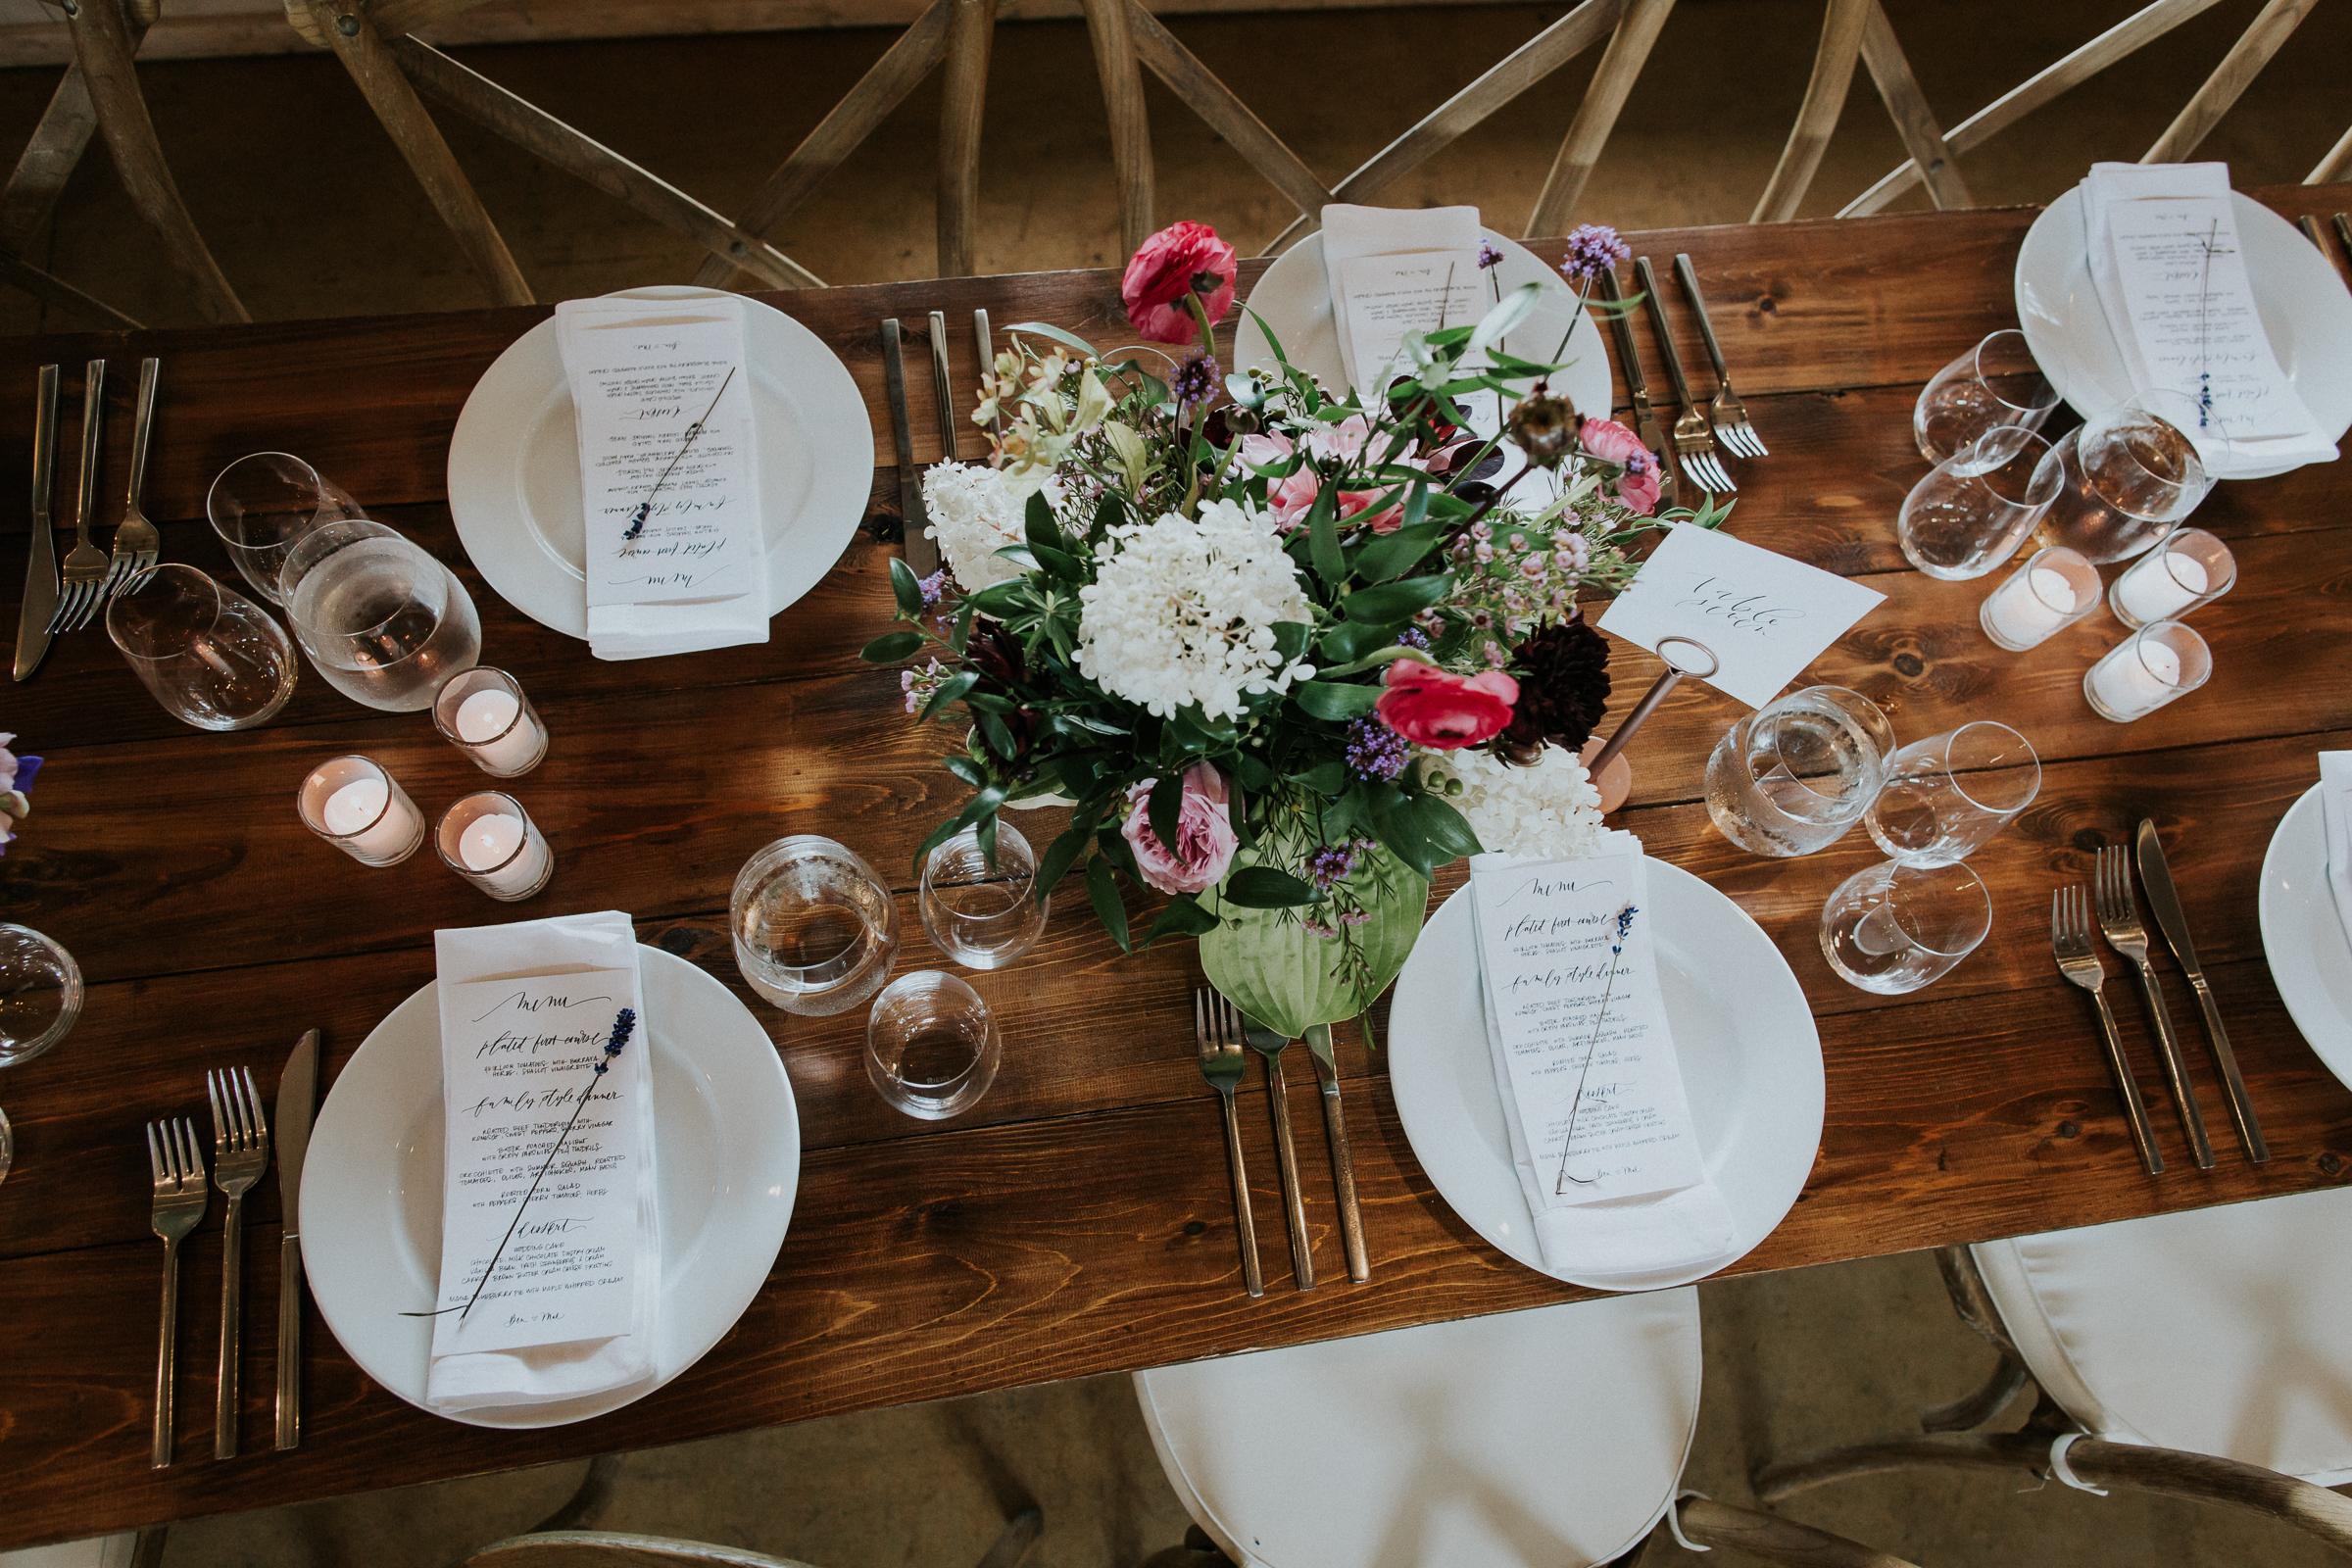 Marianmade-Farm-Wiscasset-Maine-Fine-Art-Documentary-Wedding-Photographer-Elvira-Kalviste-Photography-101.jpg